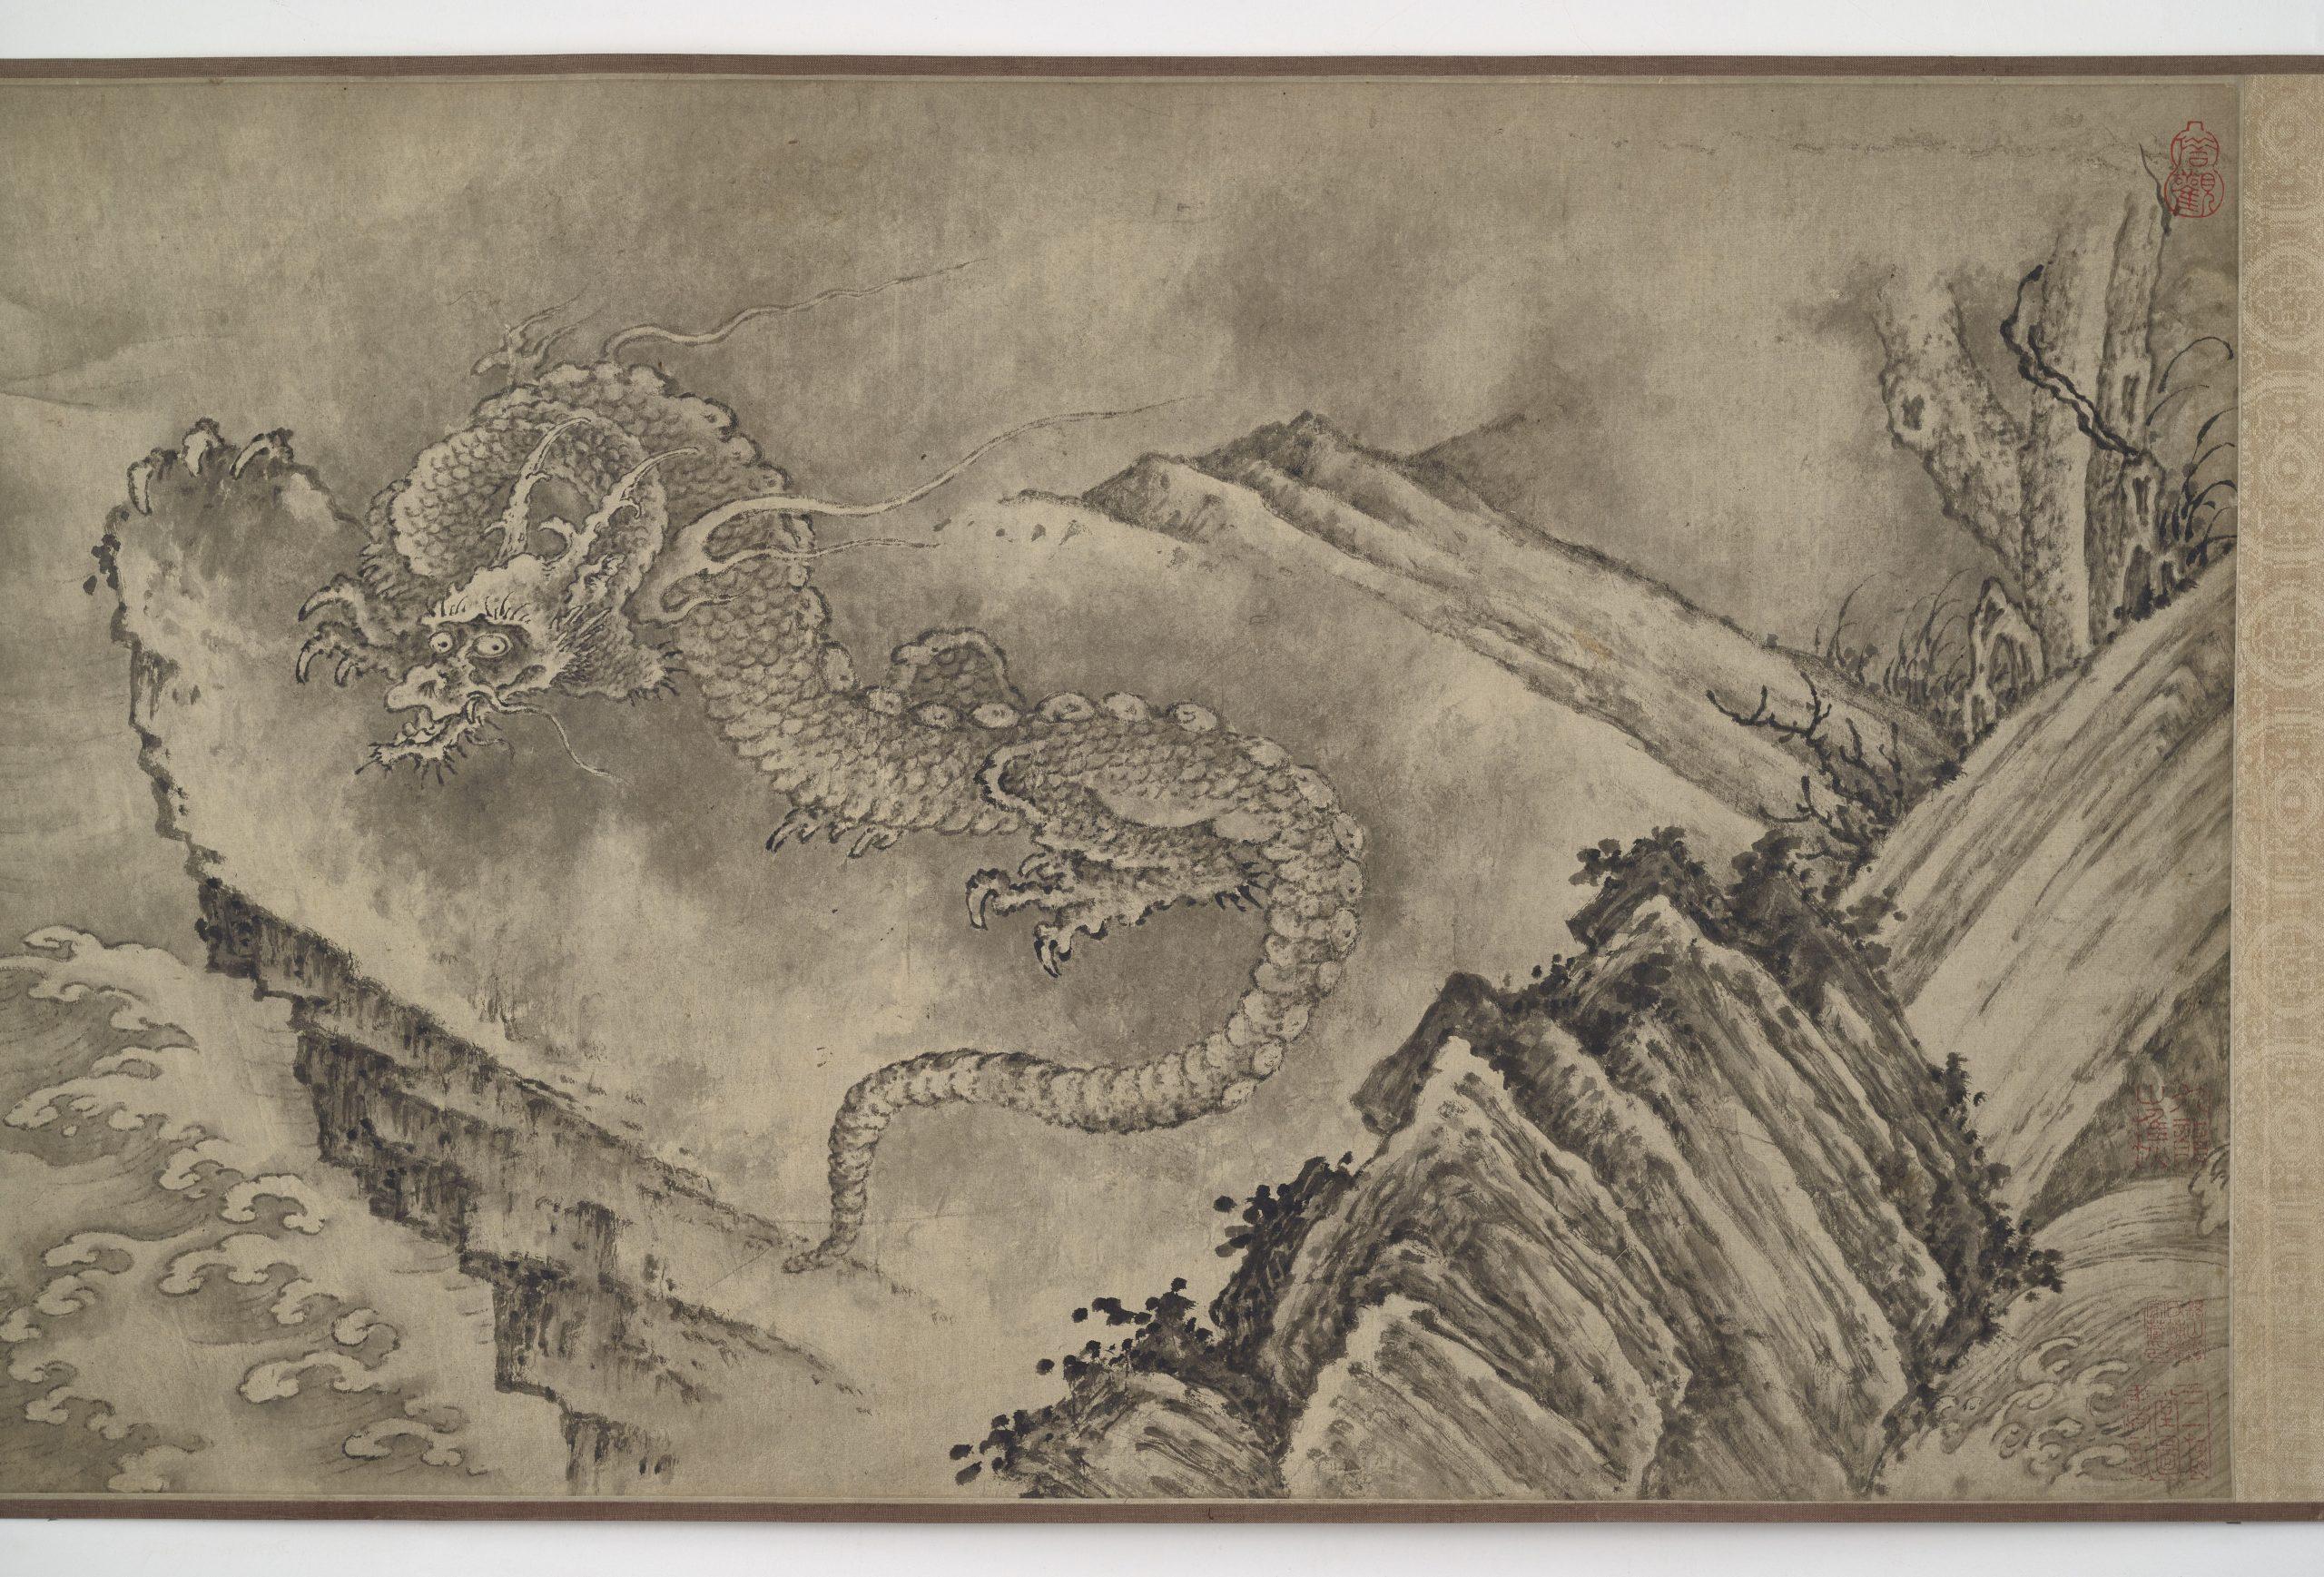 dragon in a mountainous landscape